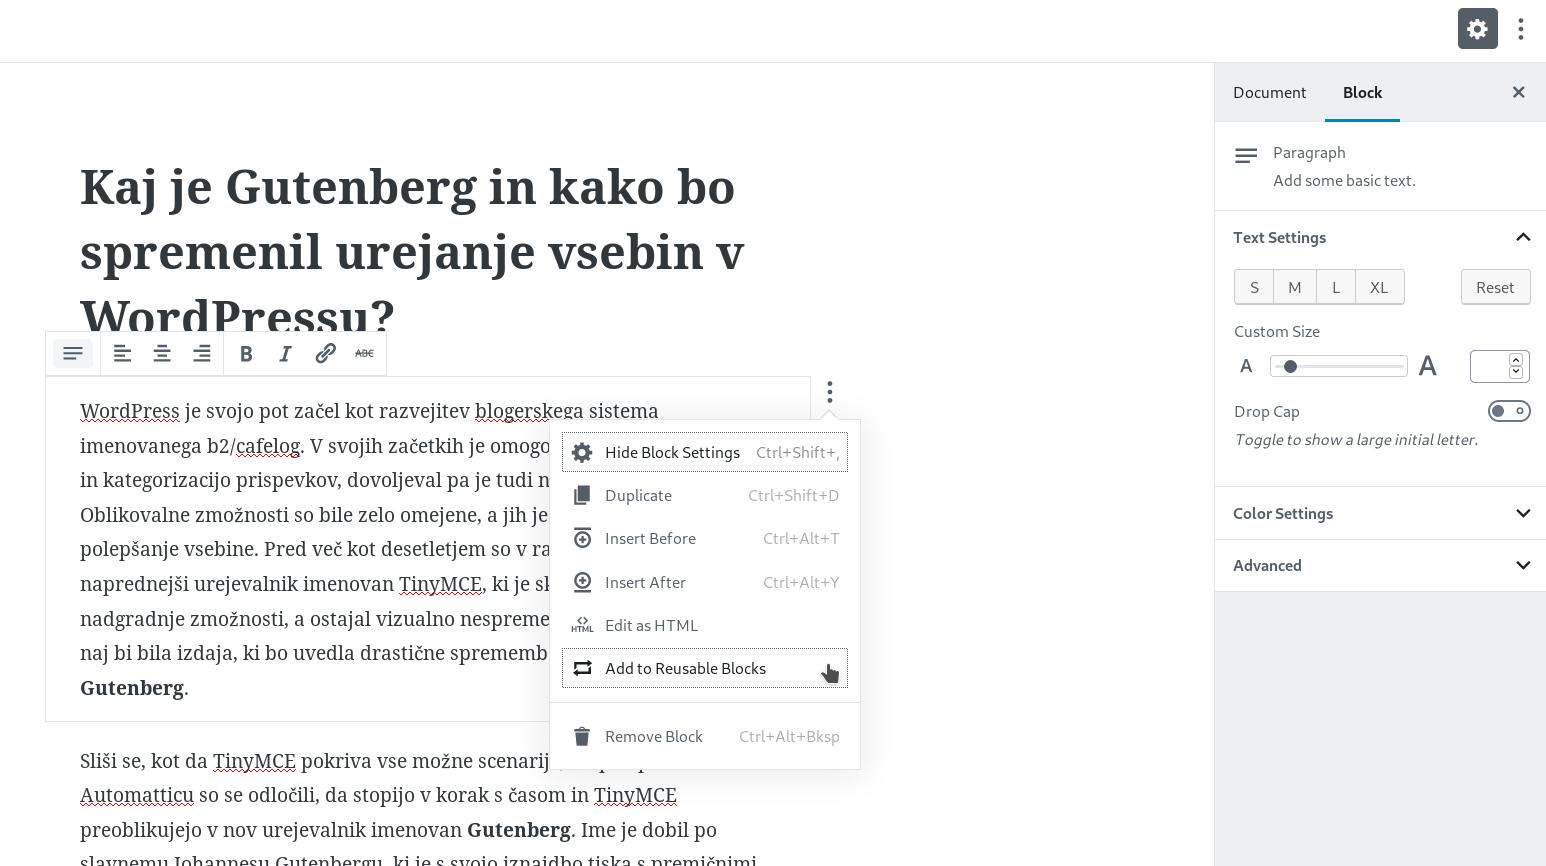 Word processor Gutenberg